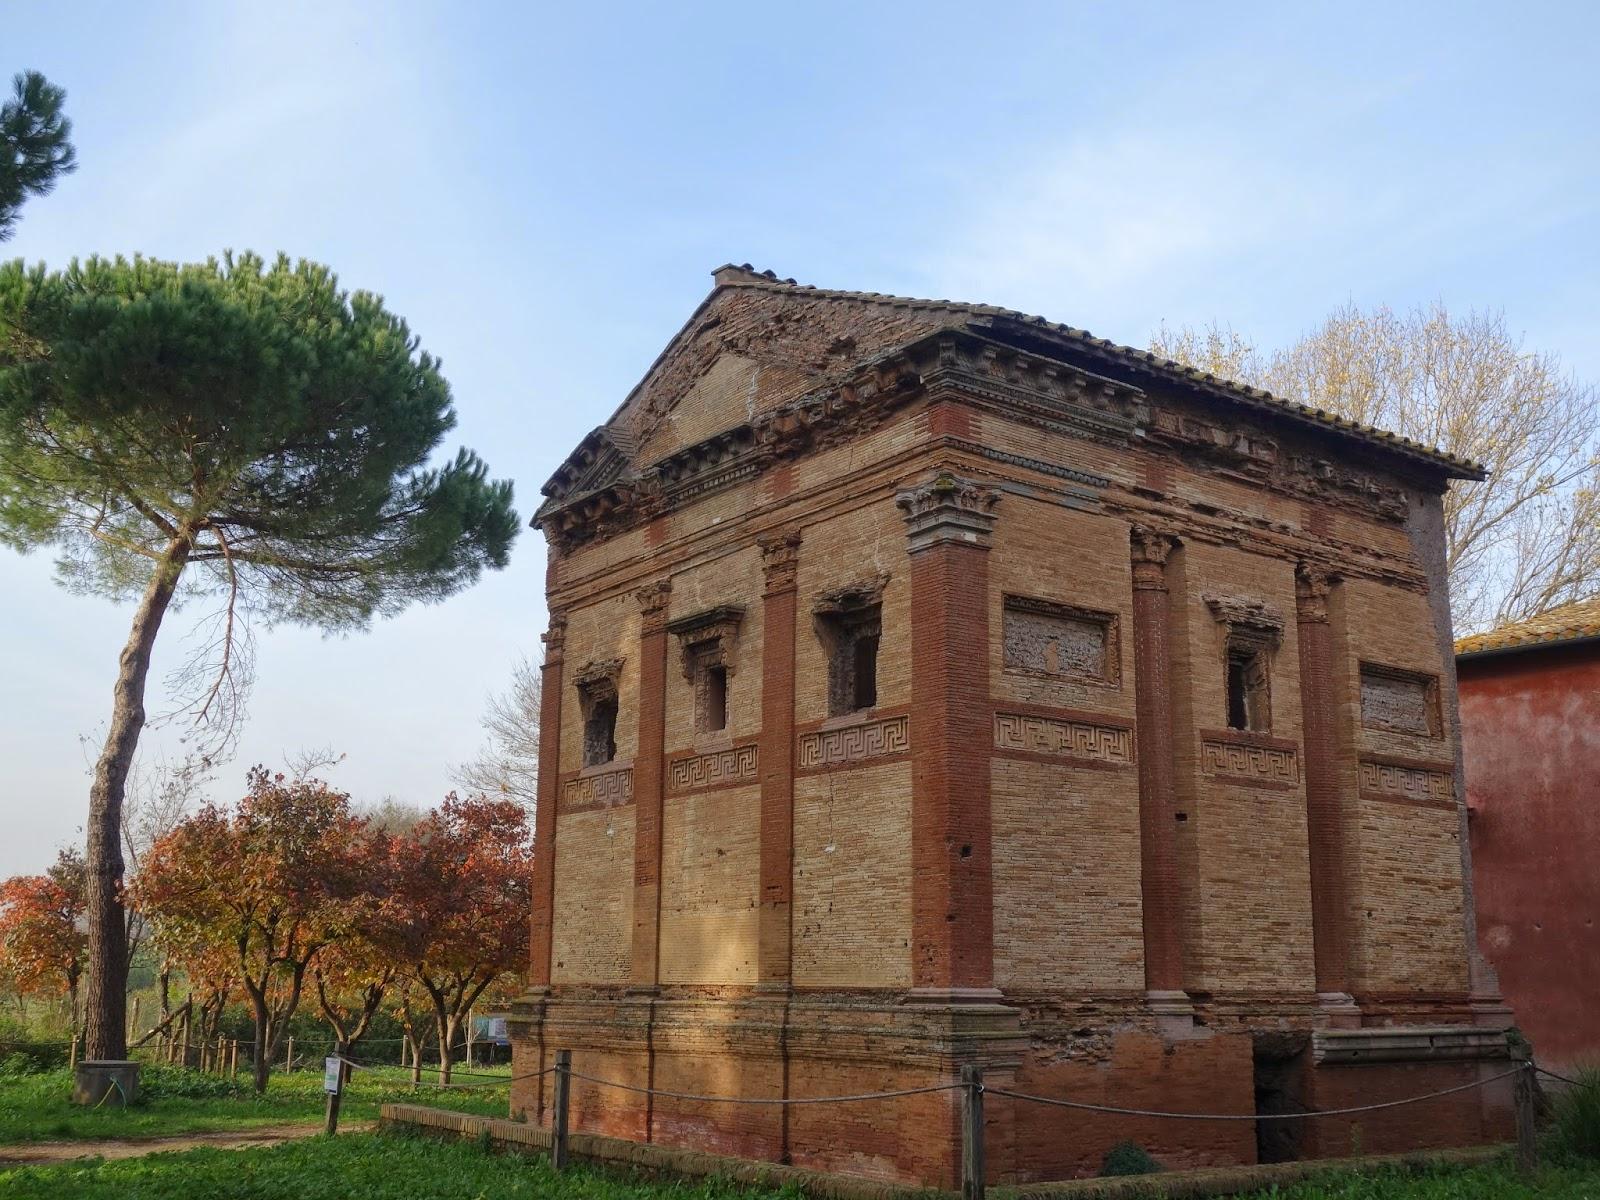 Via Appia Annia Regilla - A Via Appia Antiga